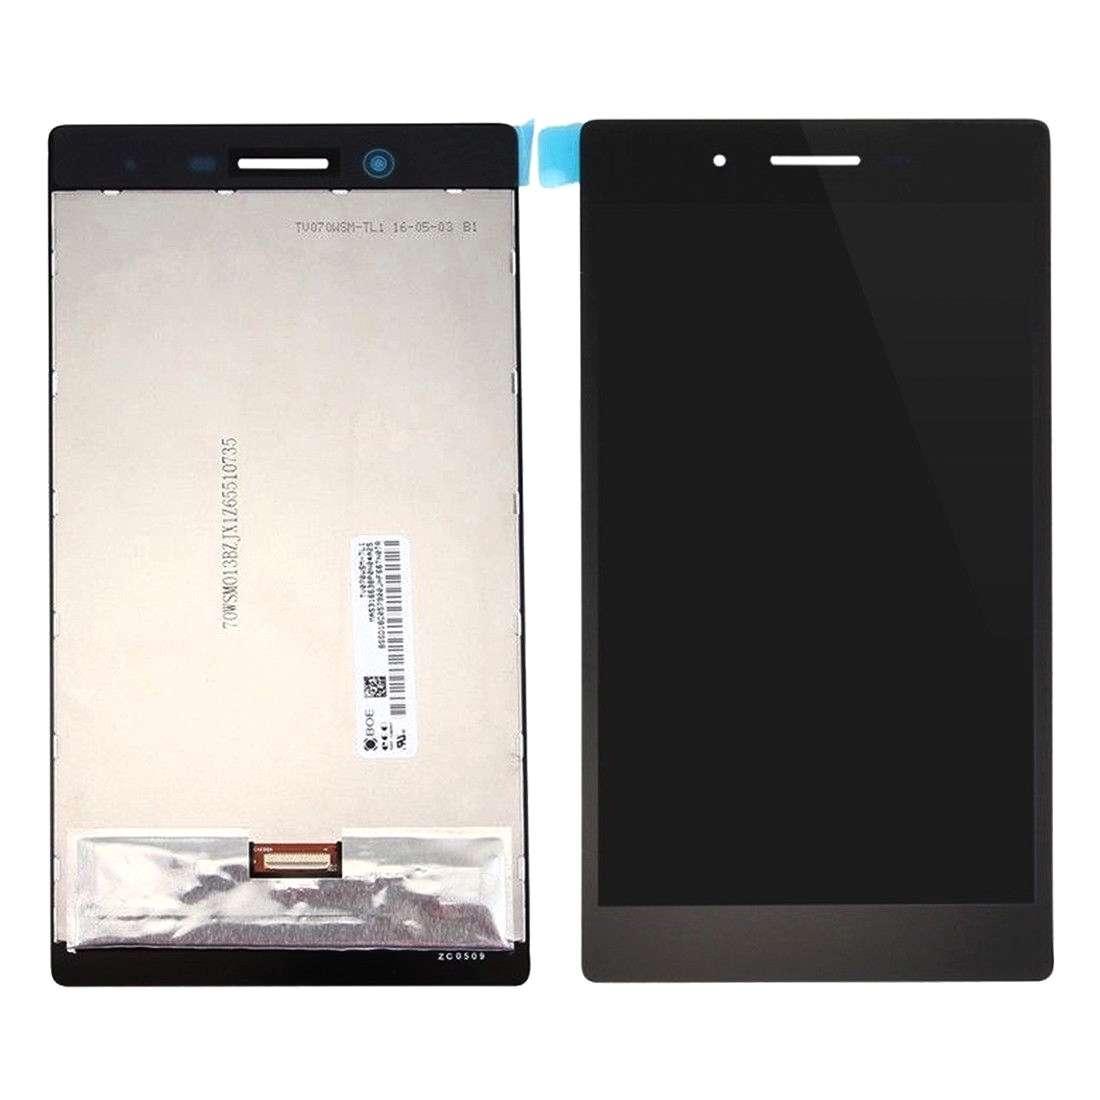 Ansamblu LCD Display Touchscreen Lenovo Tab 3 TB3 730X imagine powerlaptop.ro 2021